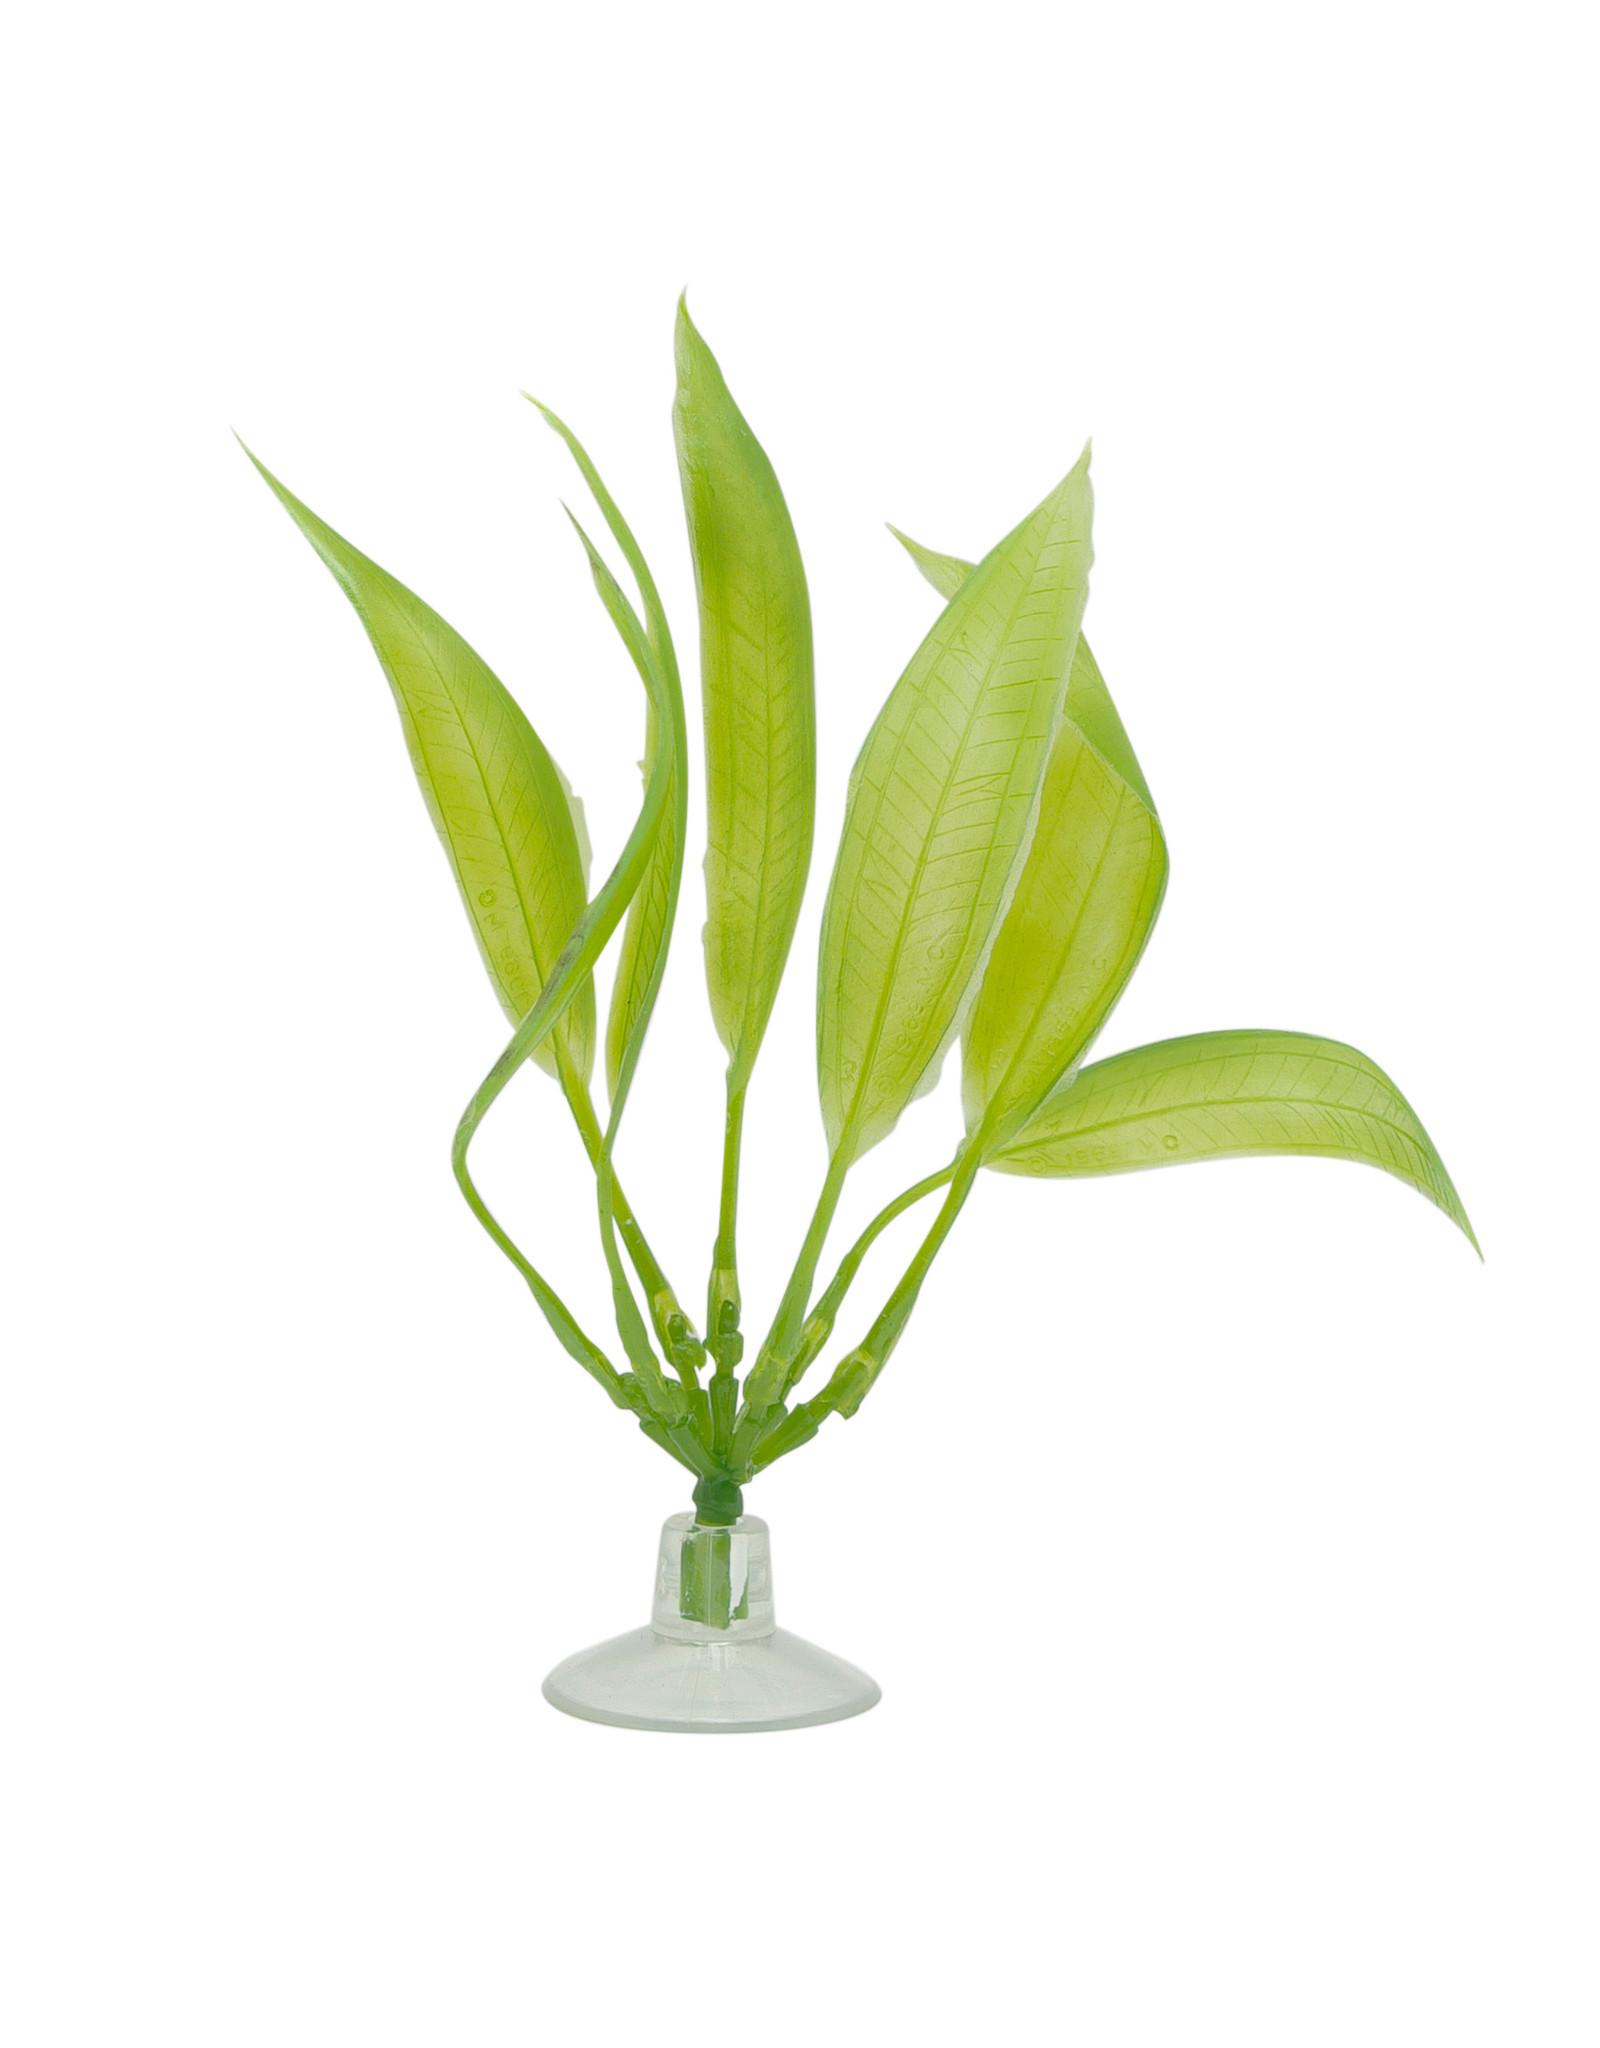 "Marina Marina Betta Amazon Sword Plant With Suction Cup - 12.7 cm (5"")"